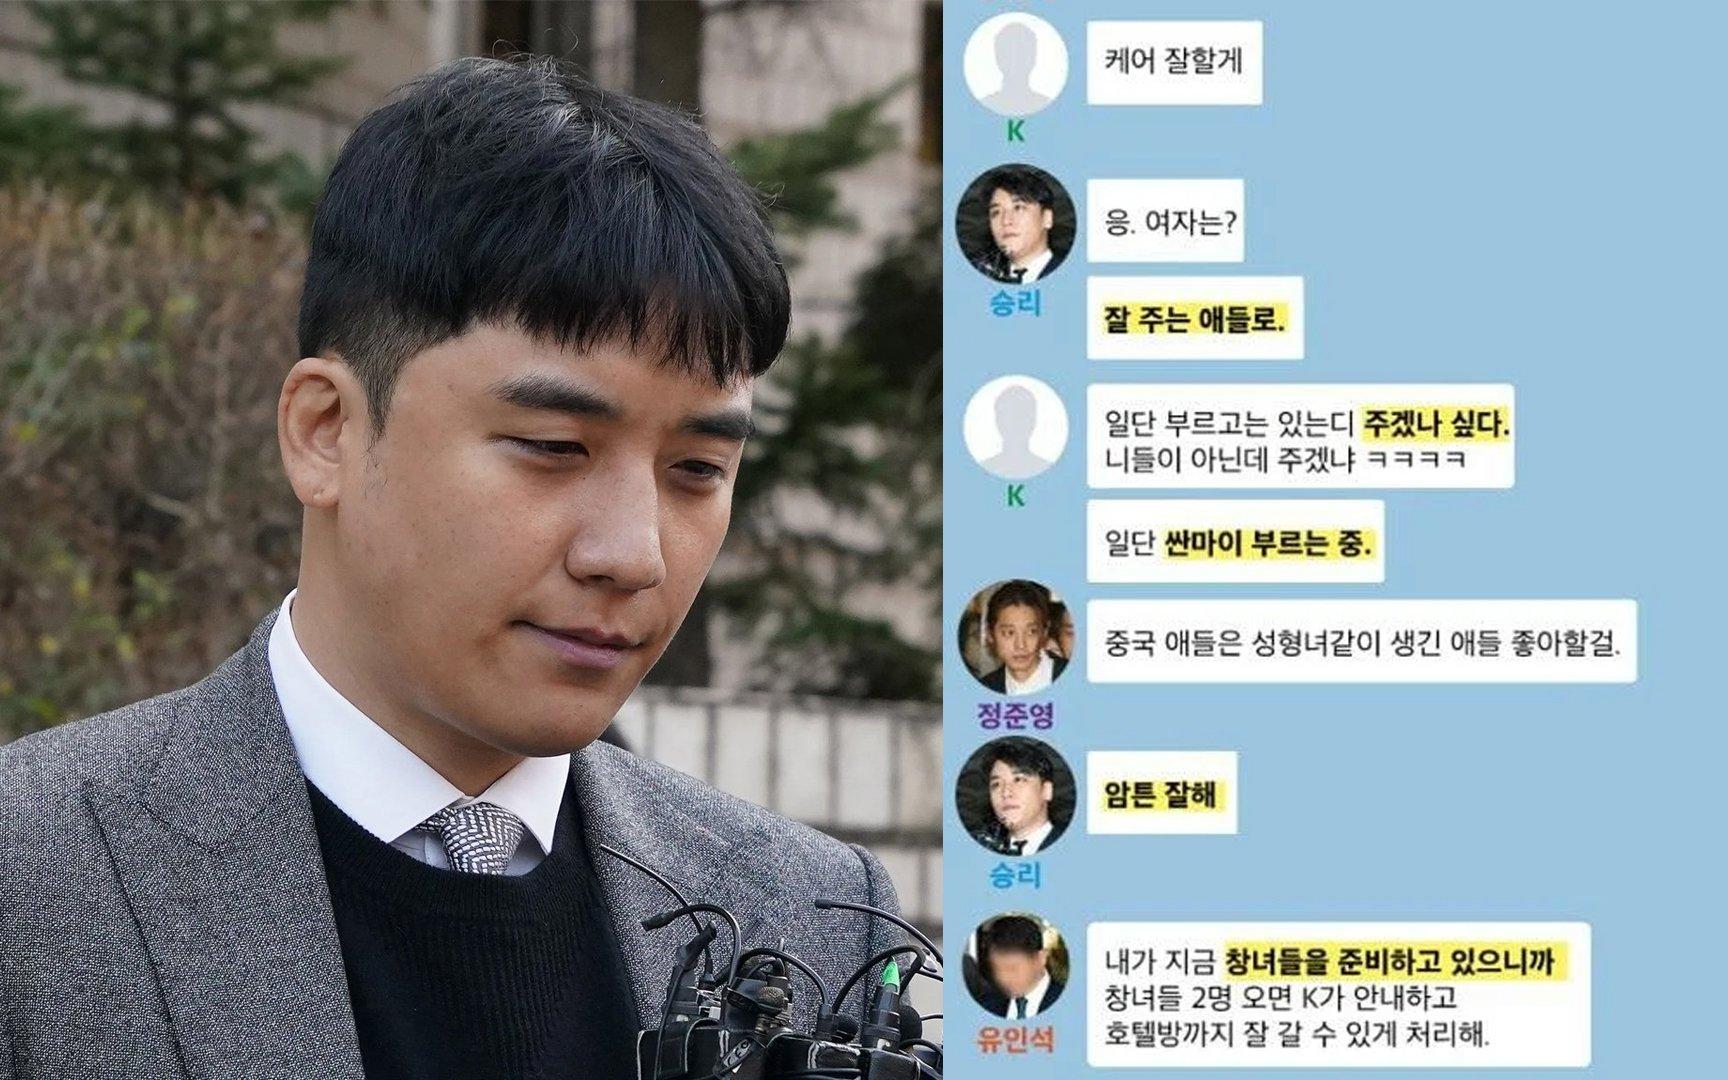 Jun young jung K